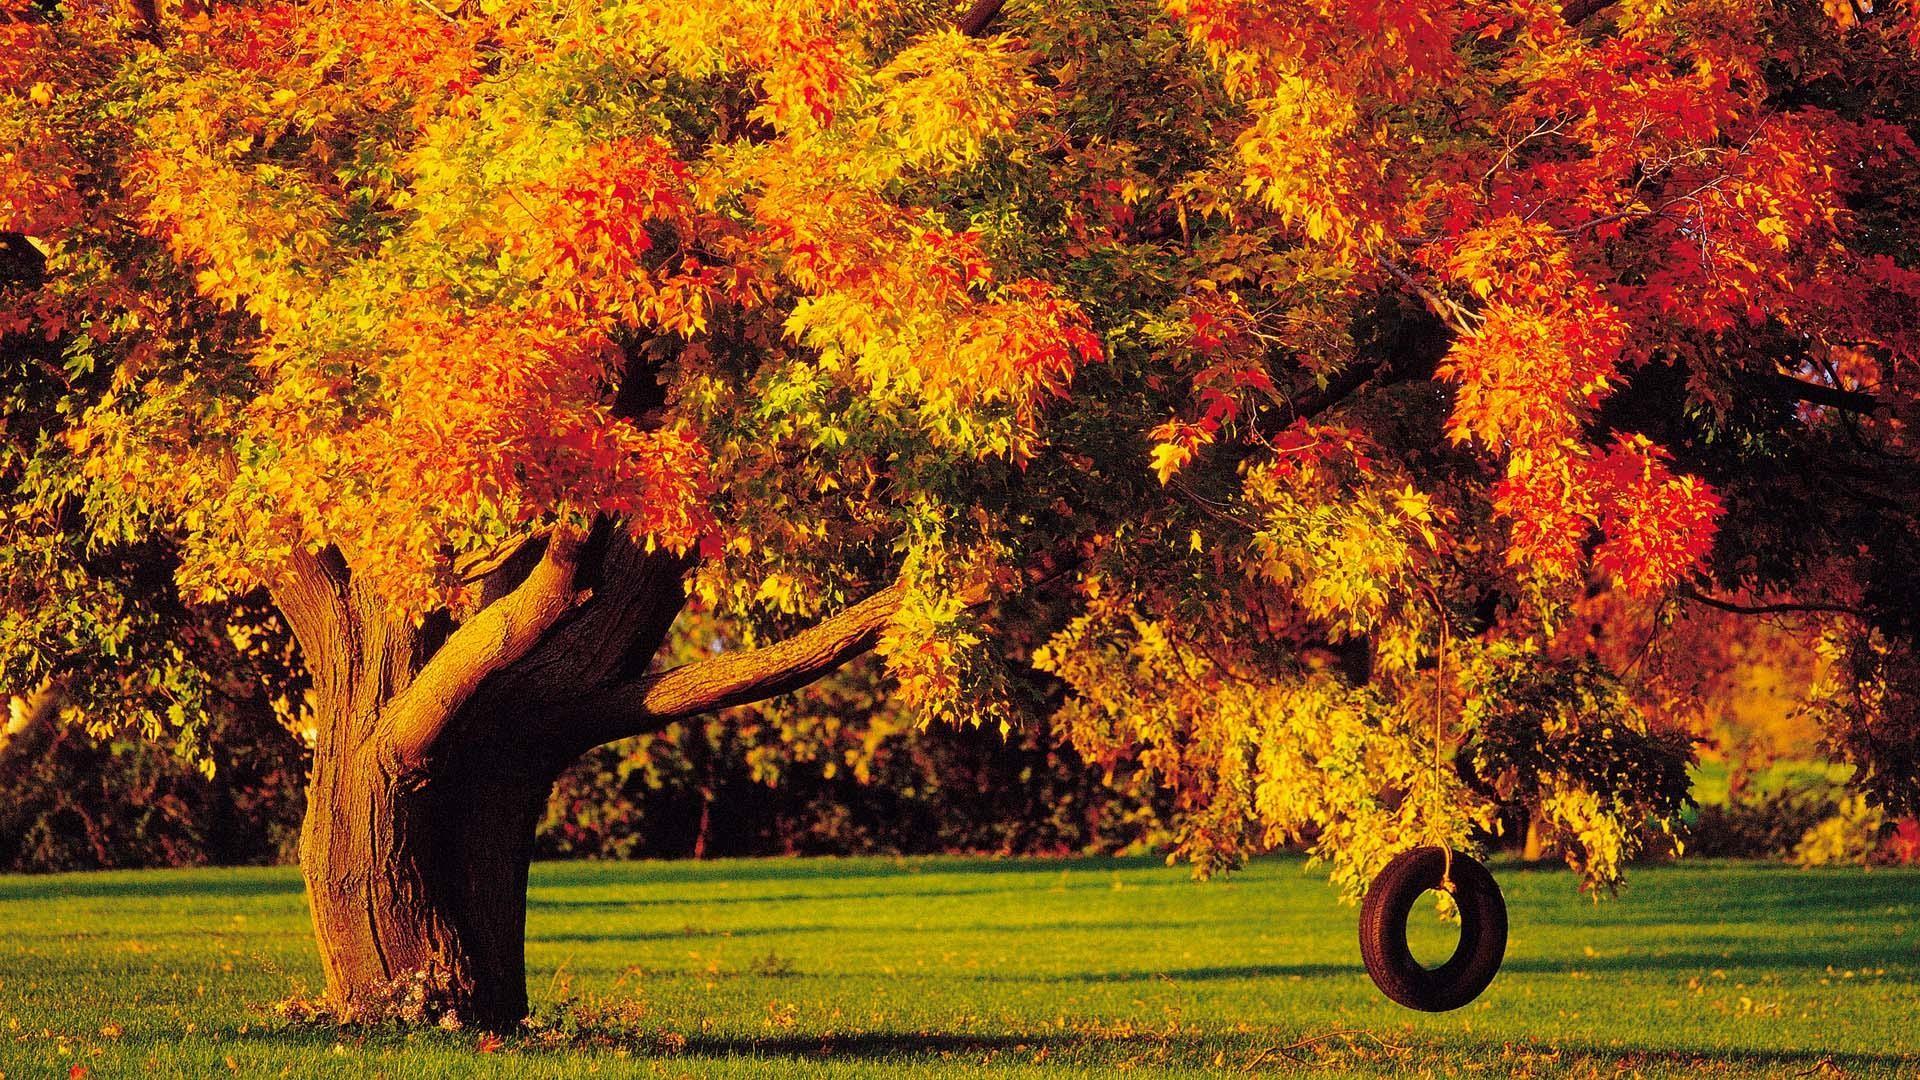 4. fall-foliage-wallpaper-for-desktop5-600×338